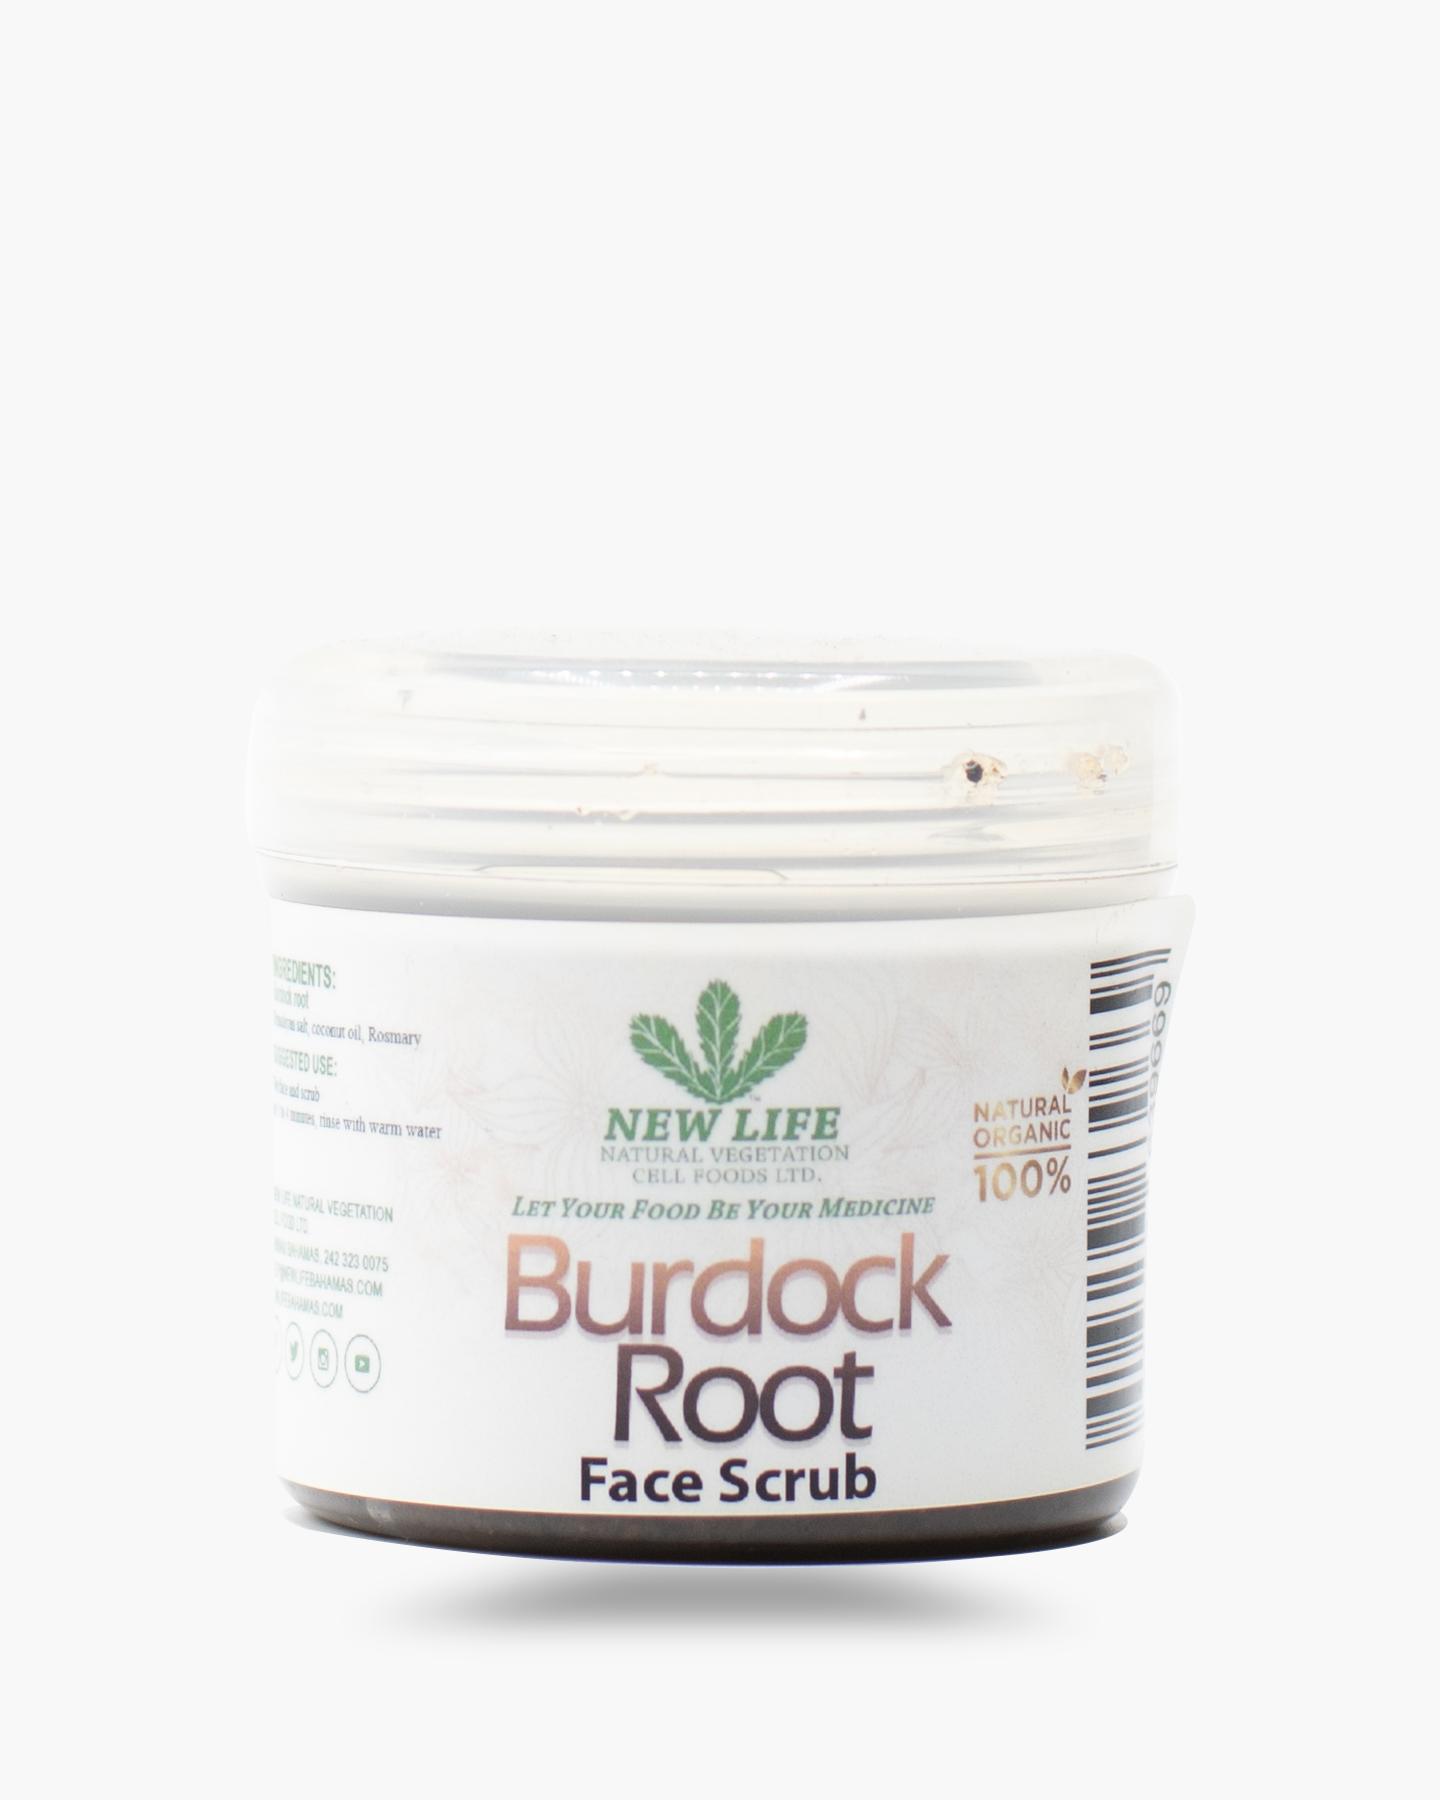 Burdock Root Face Scrub